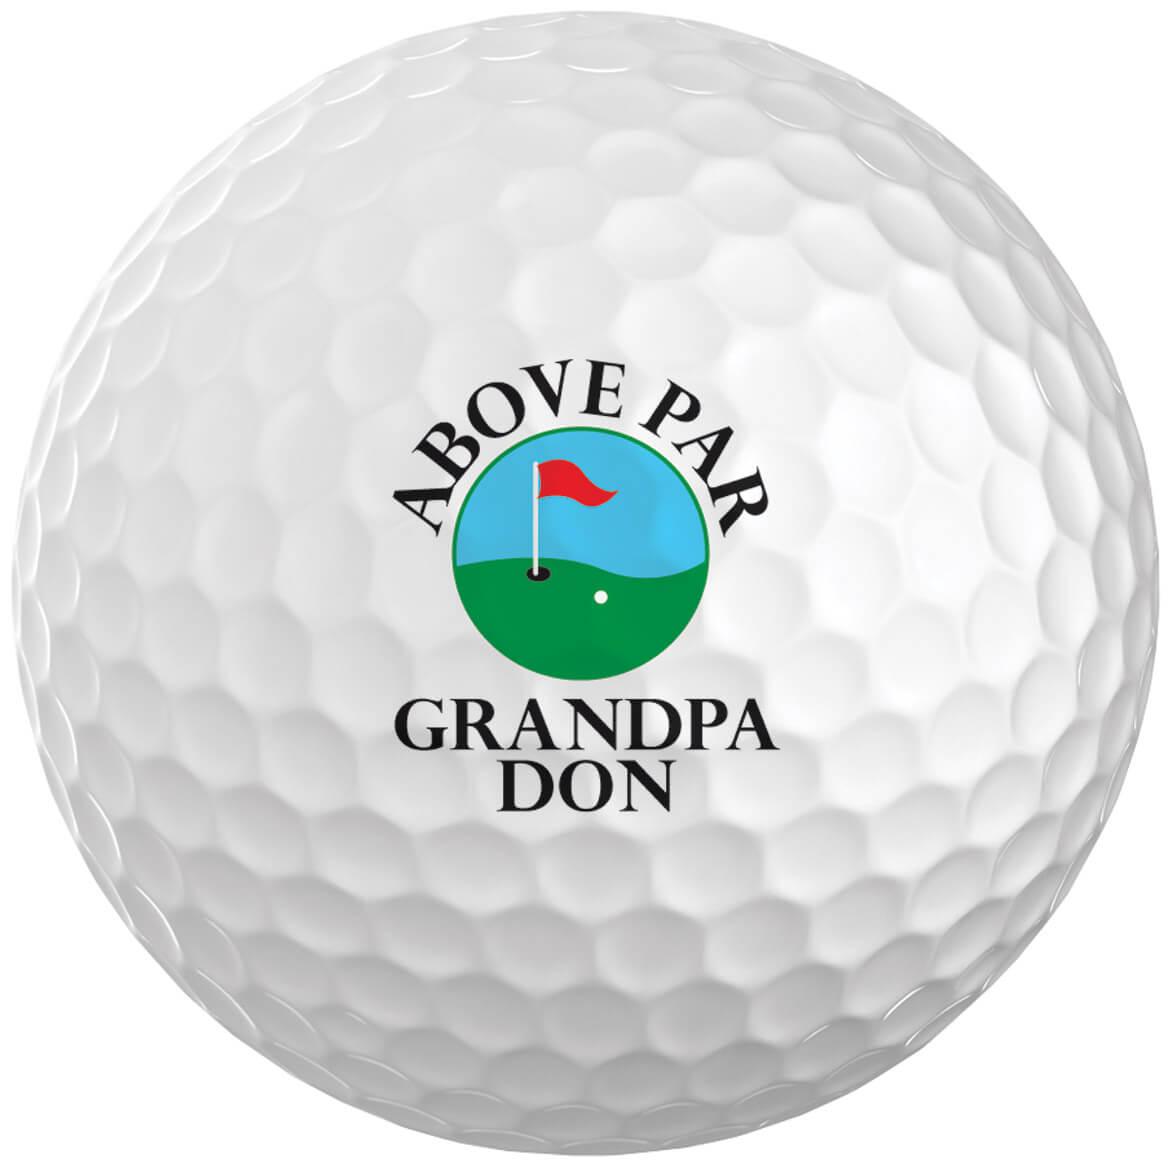 Personalized Above Par Golf Balls Set of 6